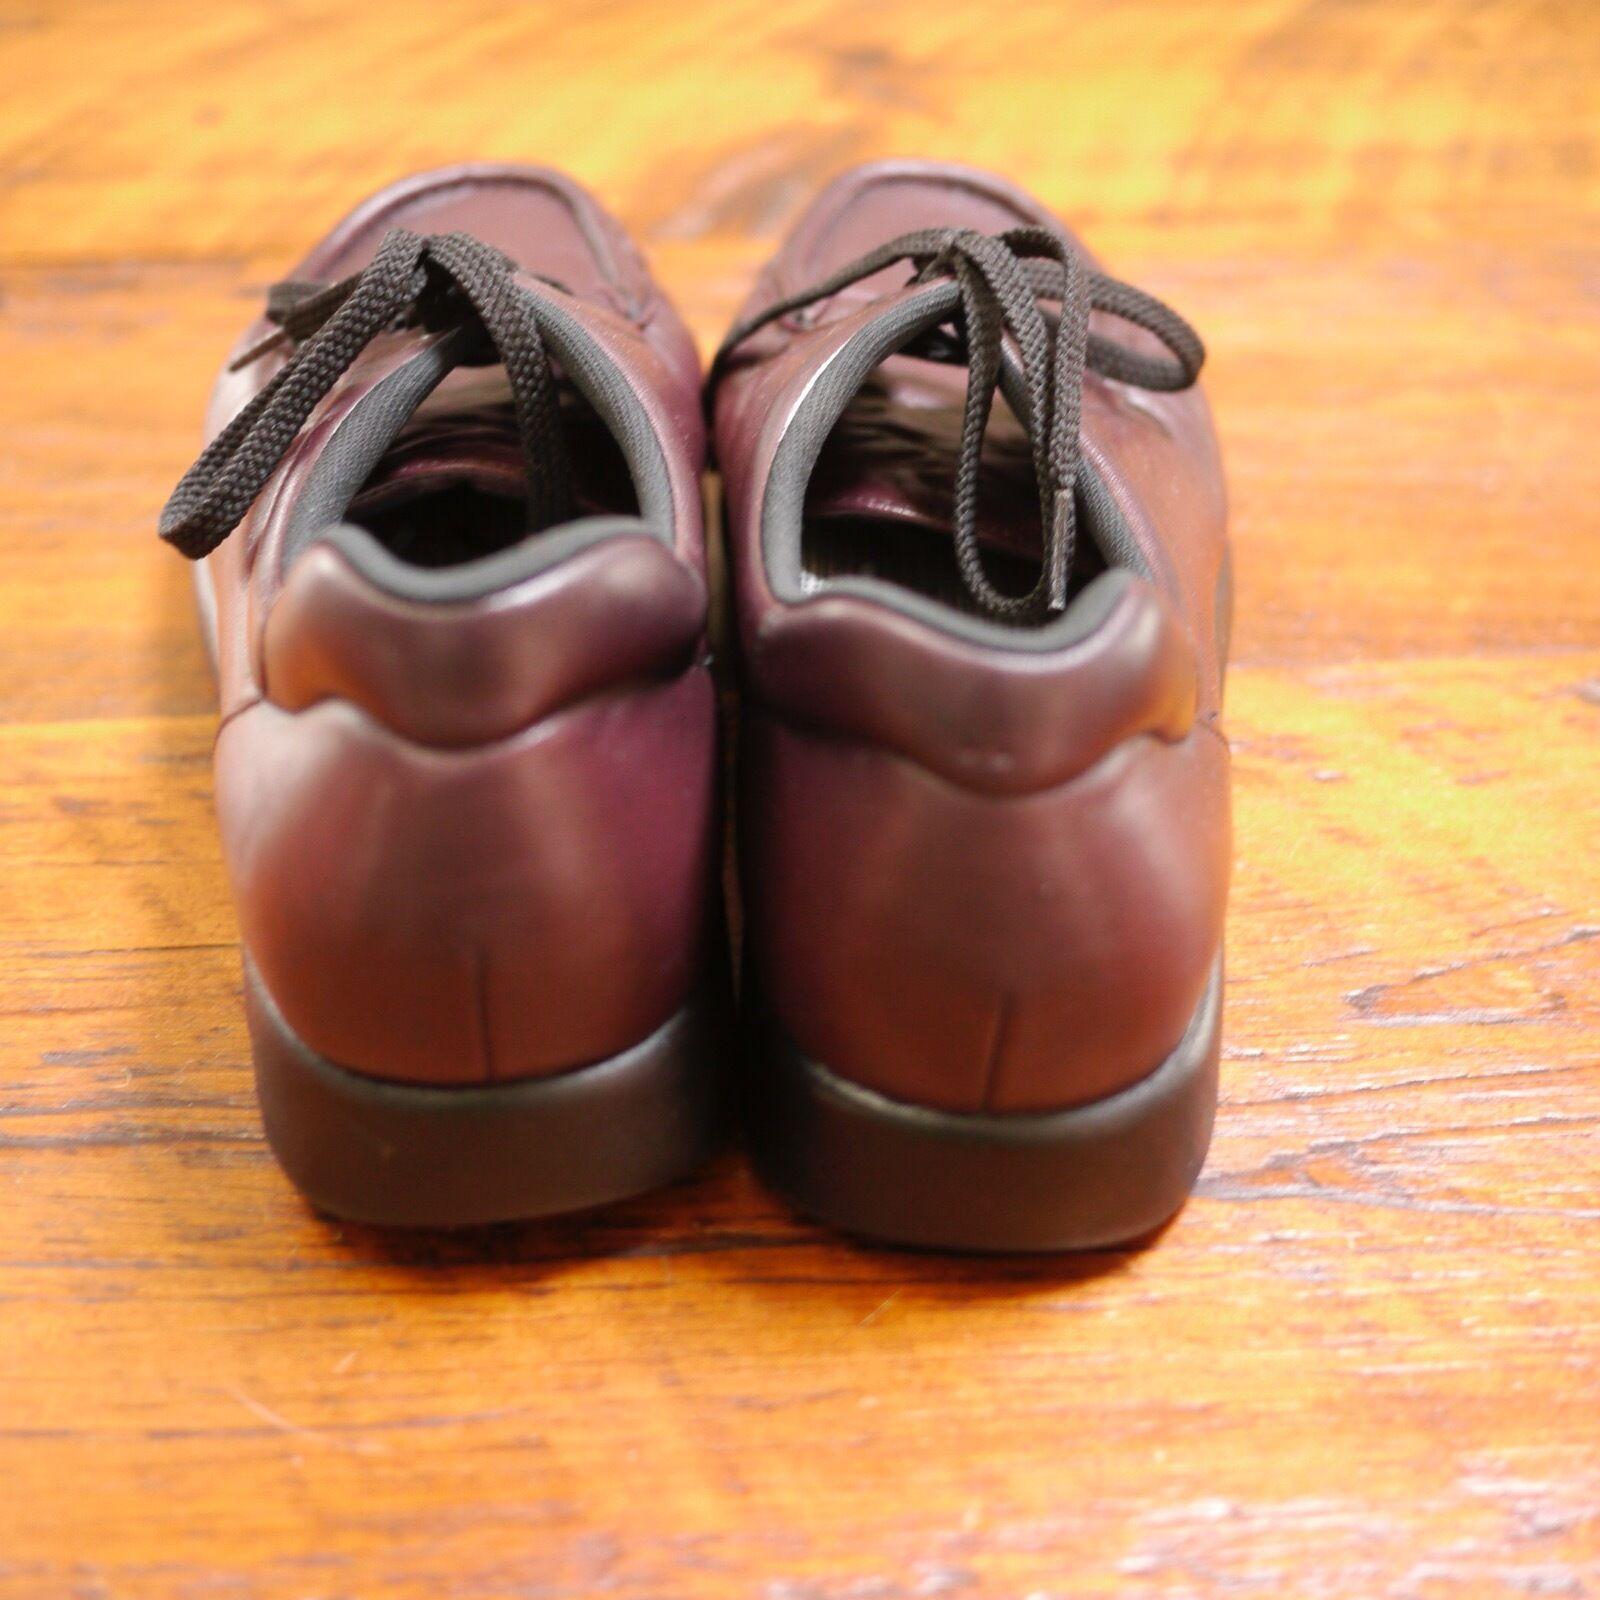 Damenschuhe Take Time SAS Tripad Schuhes Comfort Burgundy Leder USA Schuhes Tripad 11.5 42.5 4fcdc4